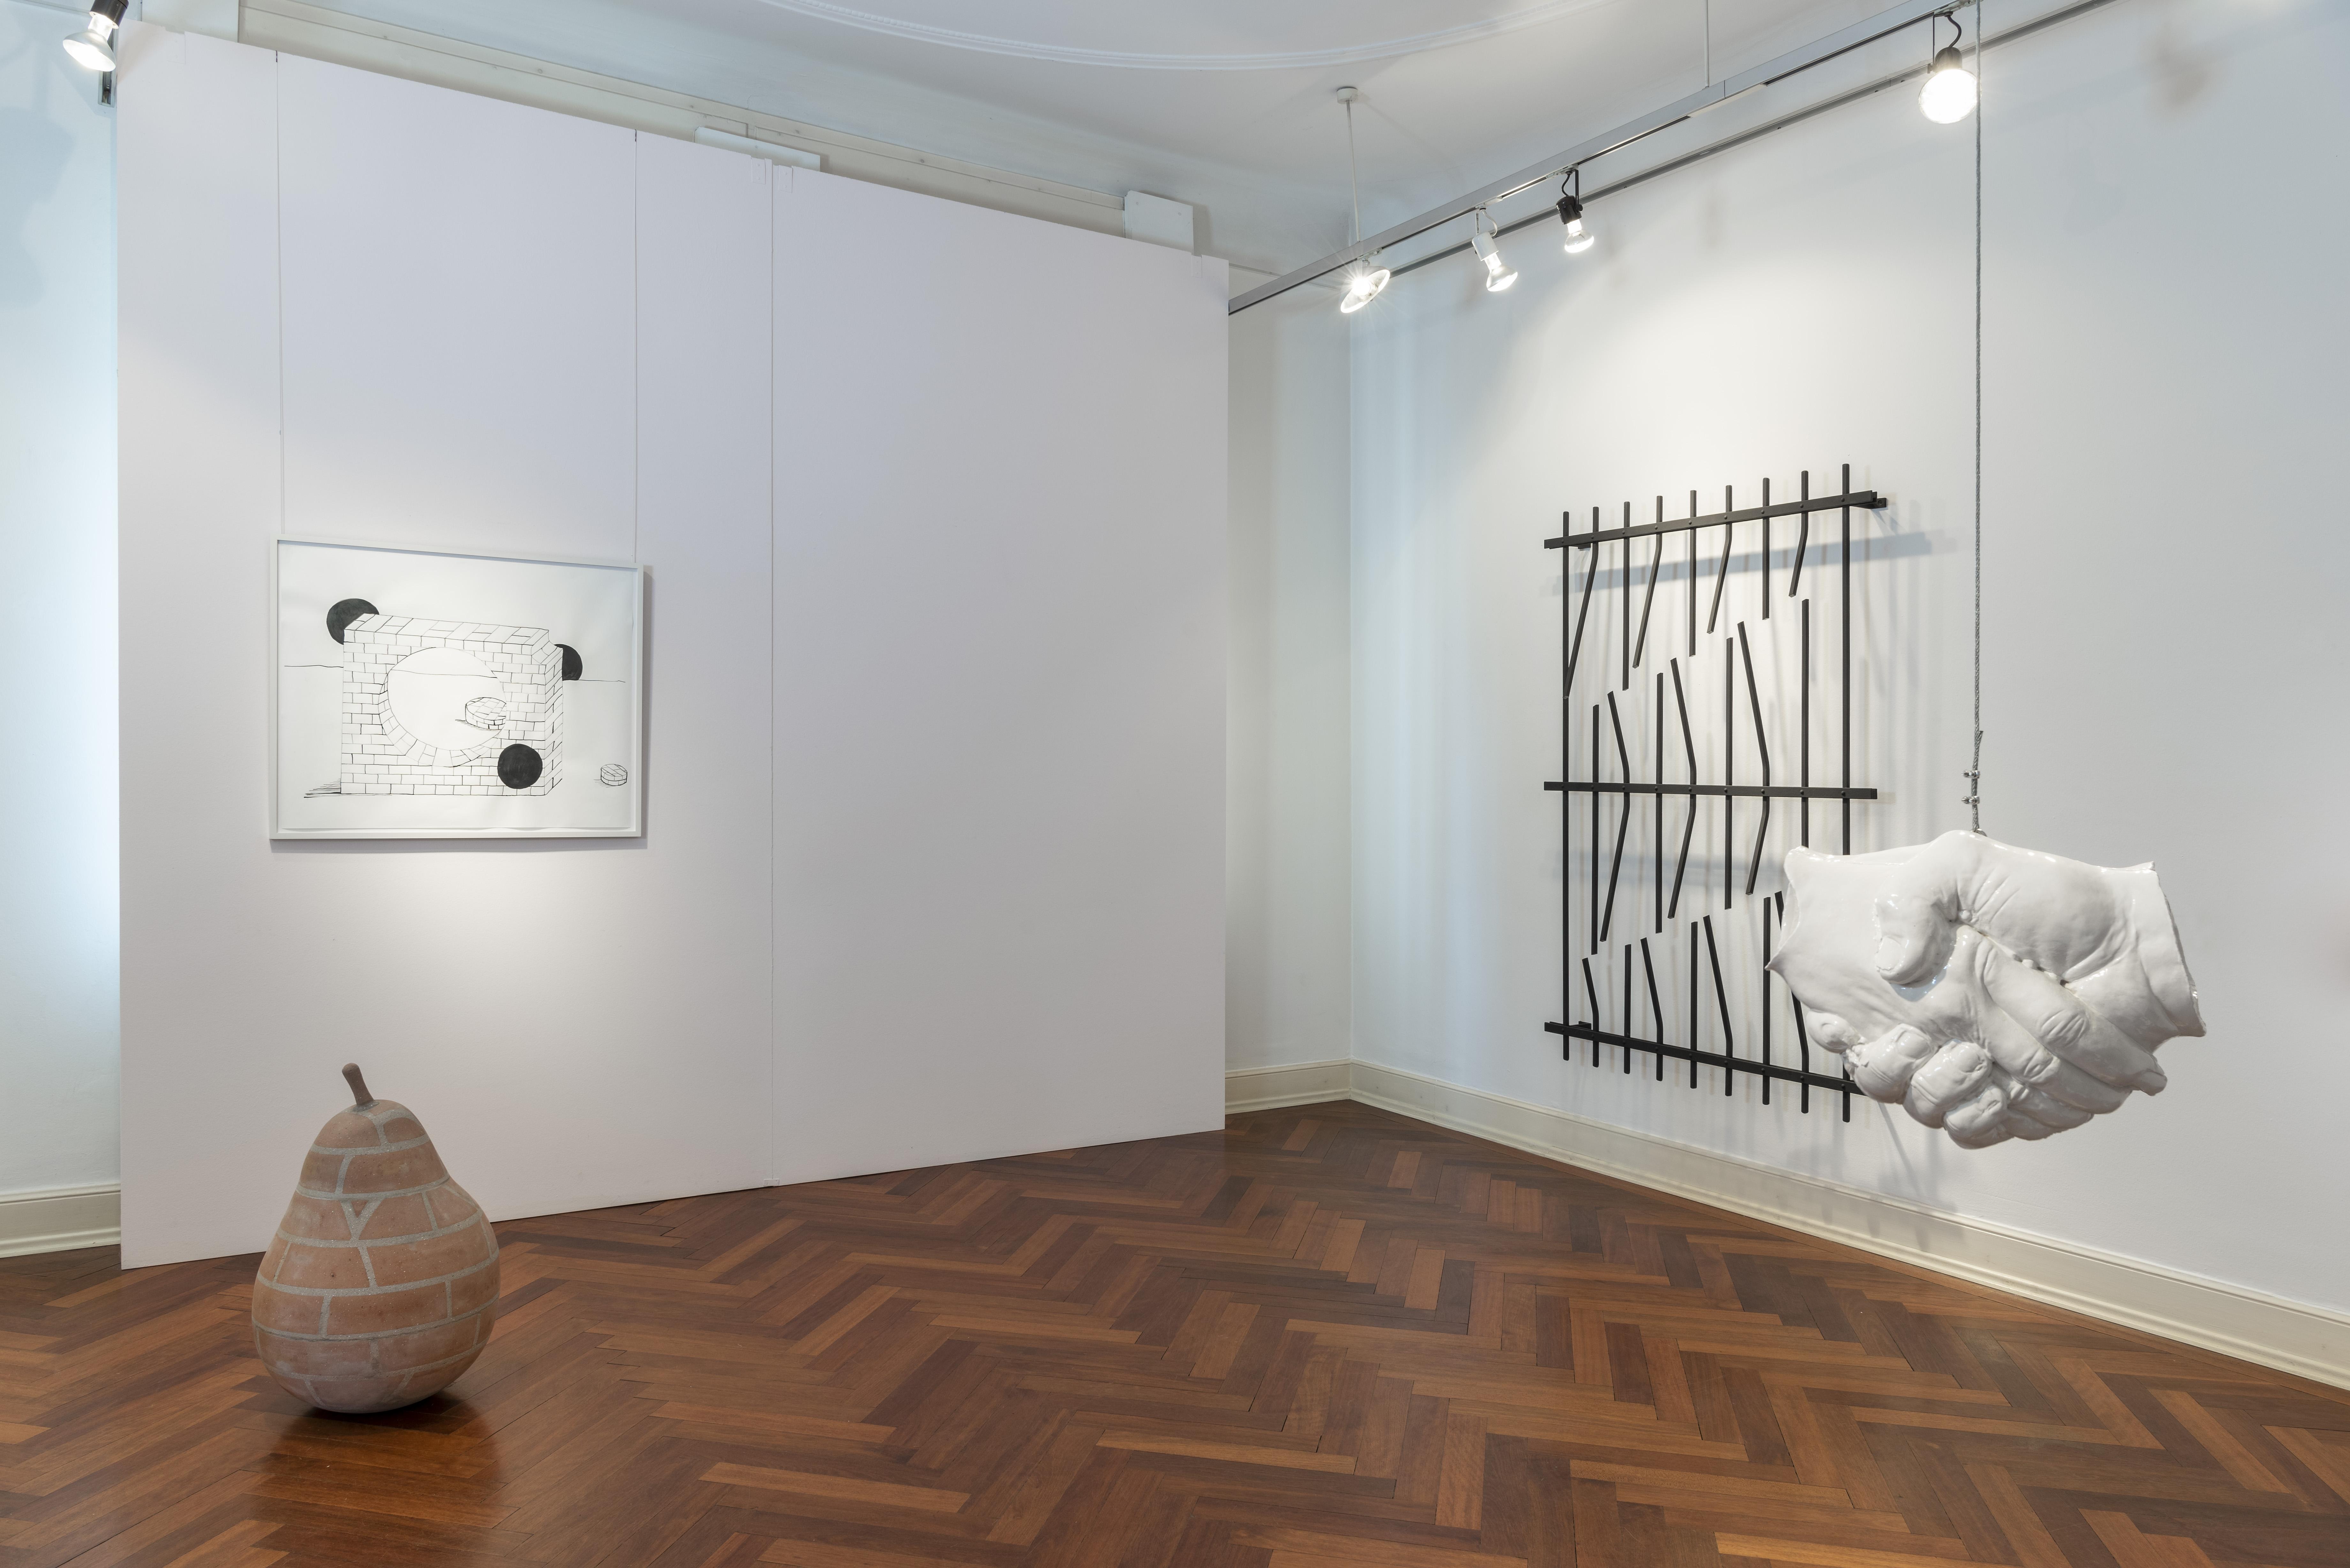 "Abbildung: ""Brechung und Bewegung – parallels"" von Vanessa Henn (rechts an der Wand)"